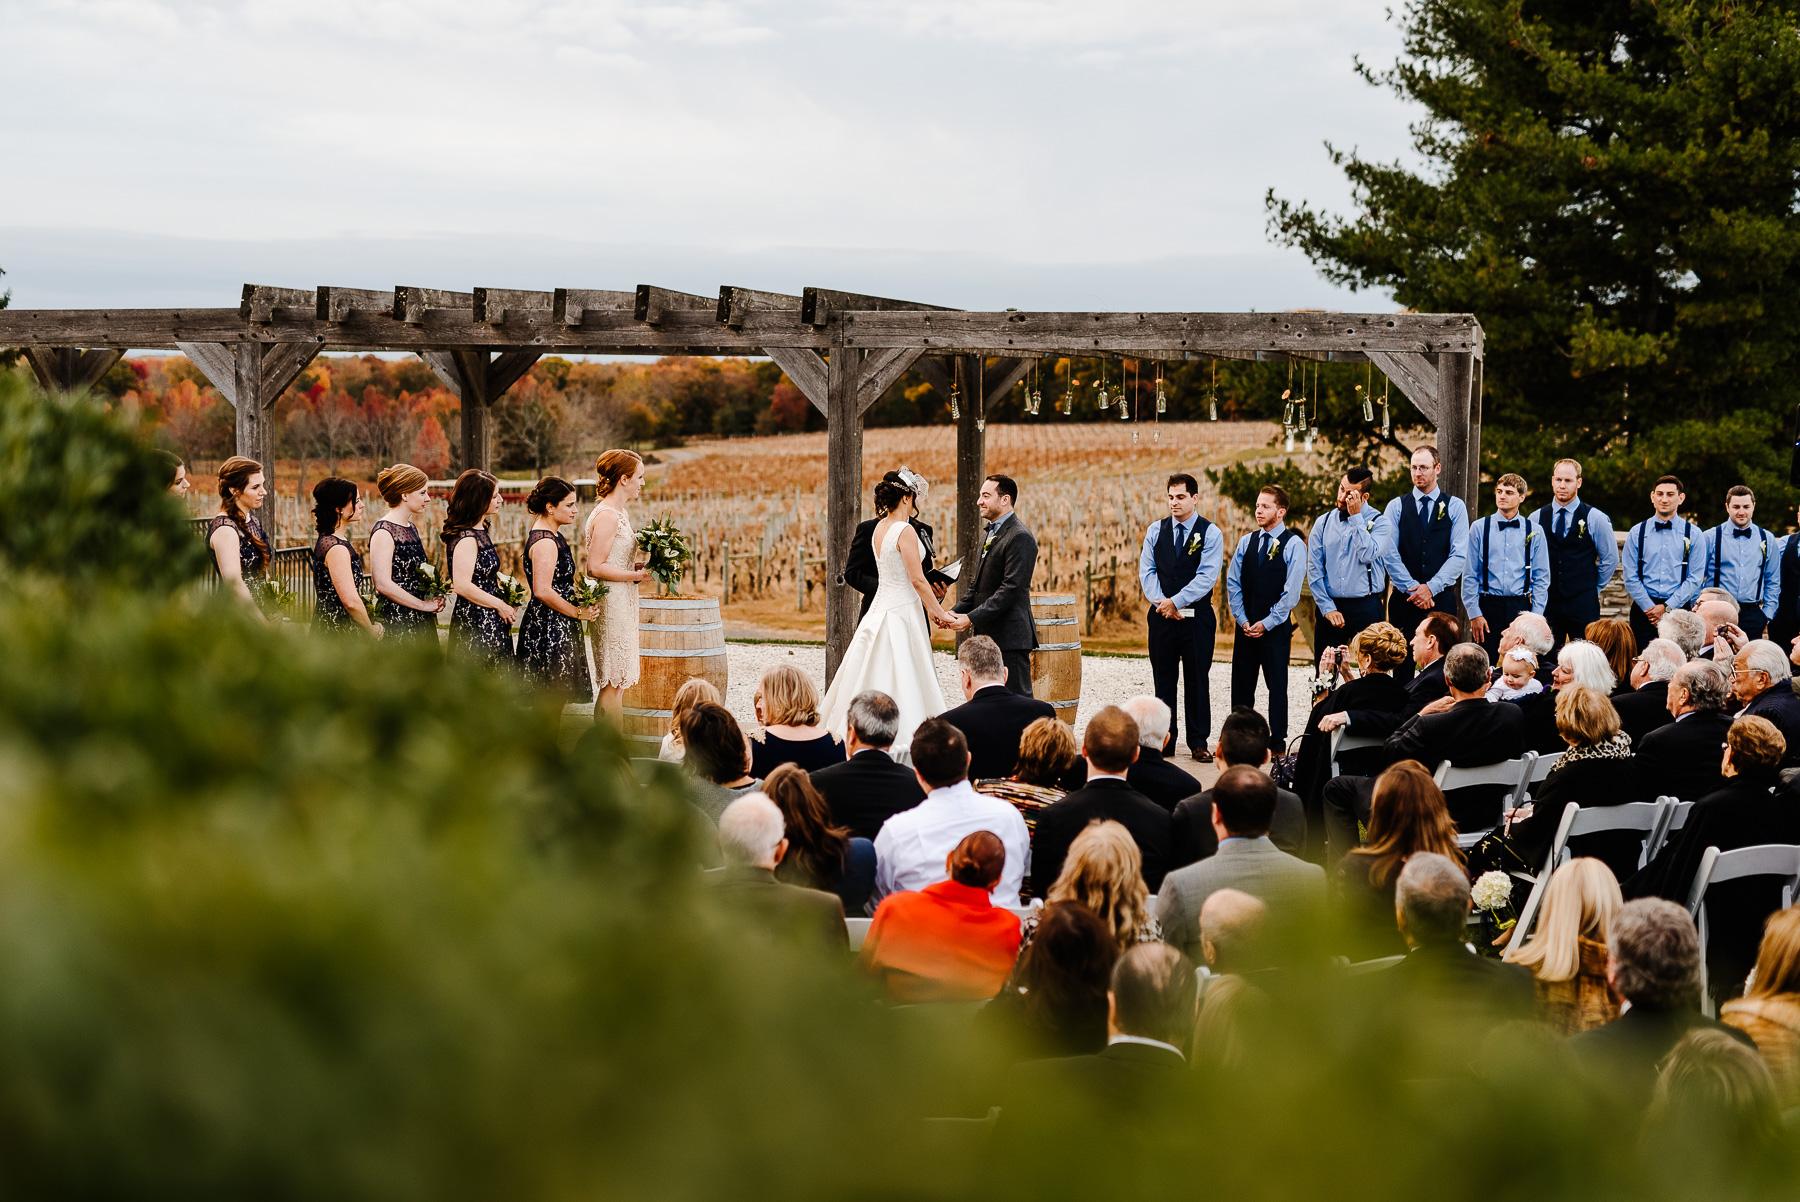 80-Laurita Winery Wedding New Jersey Wedding Photographer Laurita Winery Weddings Longbrook Photography.jpg